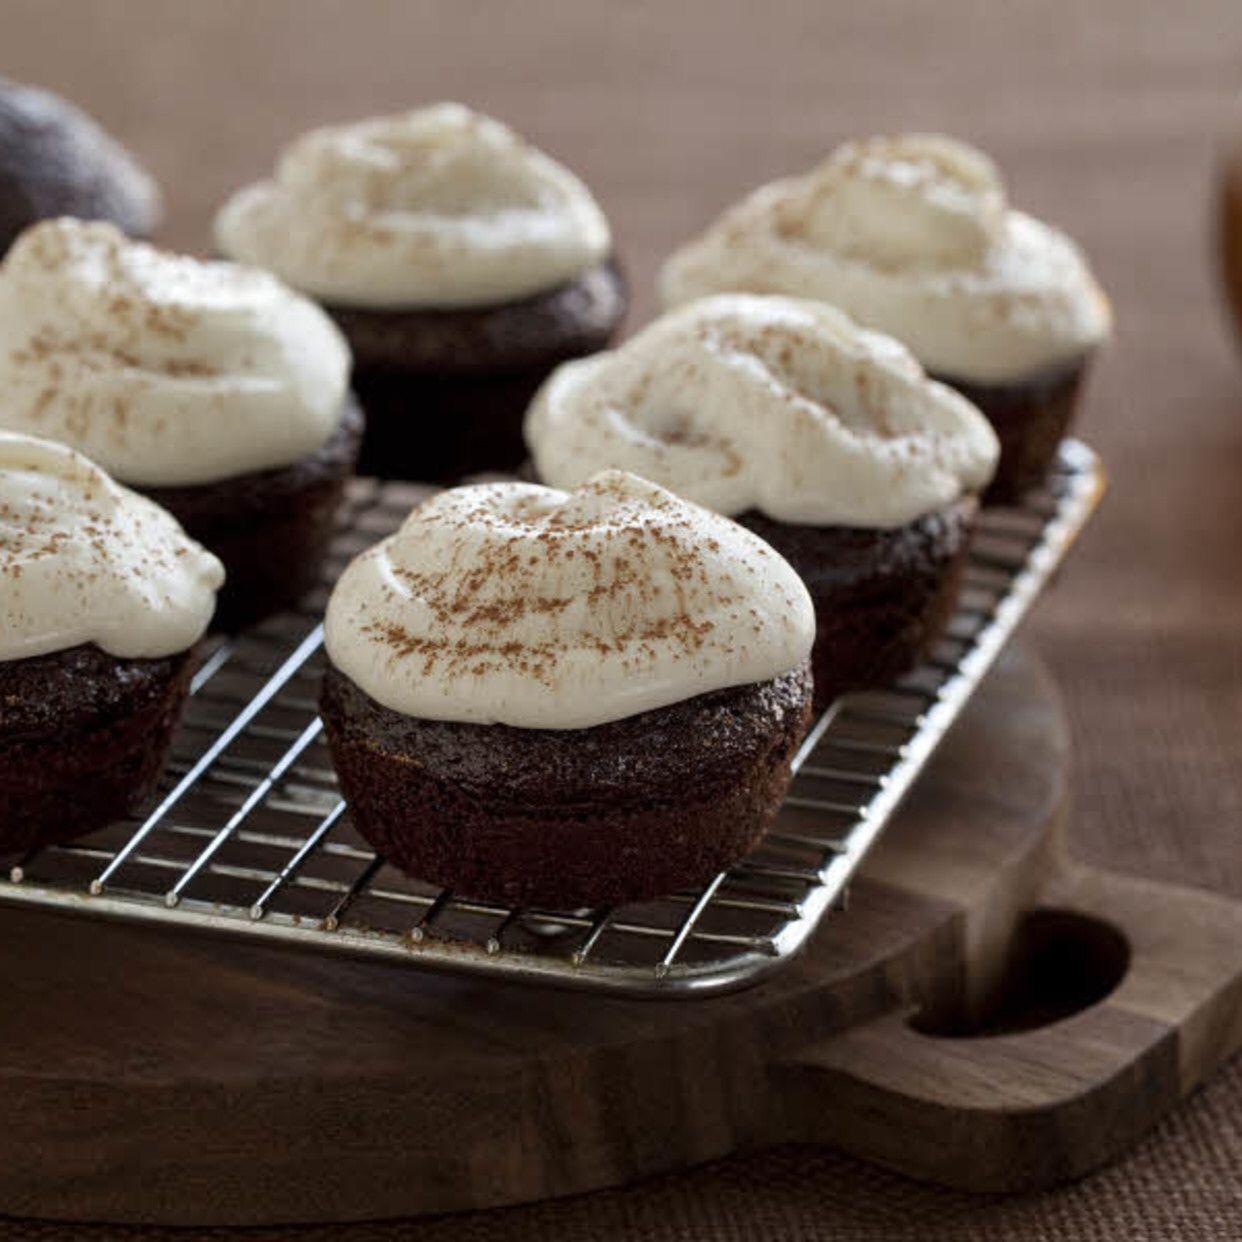 Chocolate Stout Cupcakes | Recipe in 2020 | Chocolate stout, Cupcake recipes, Desserts